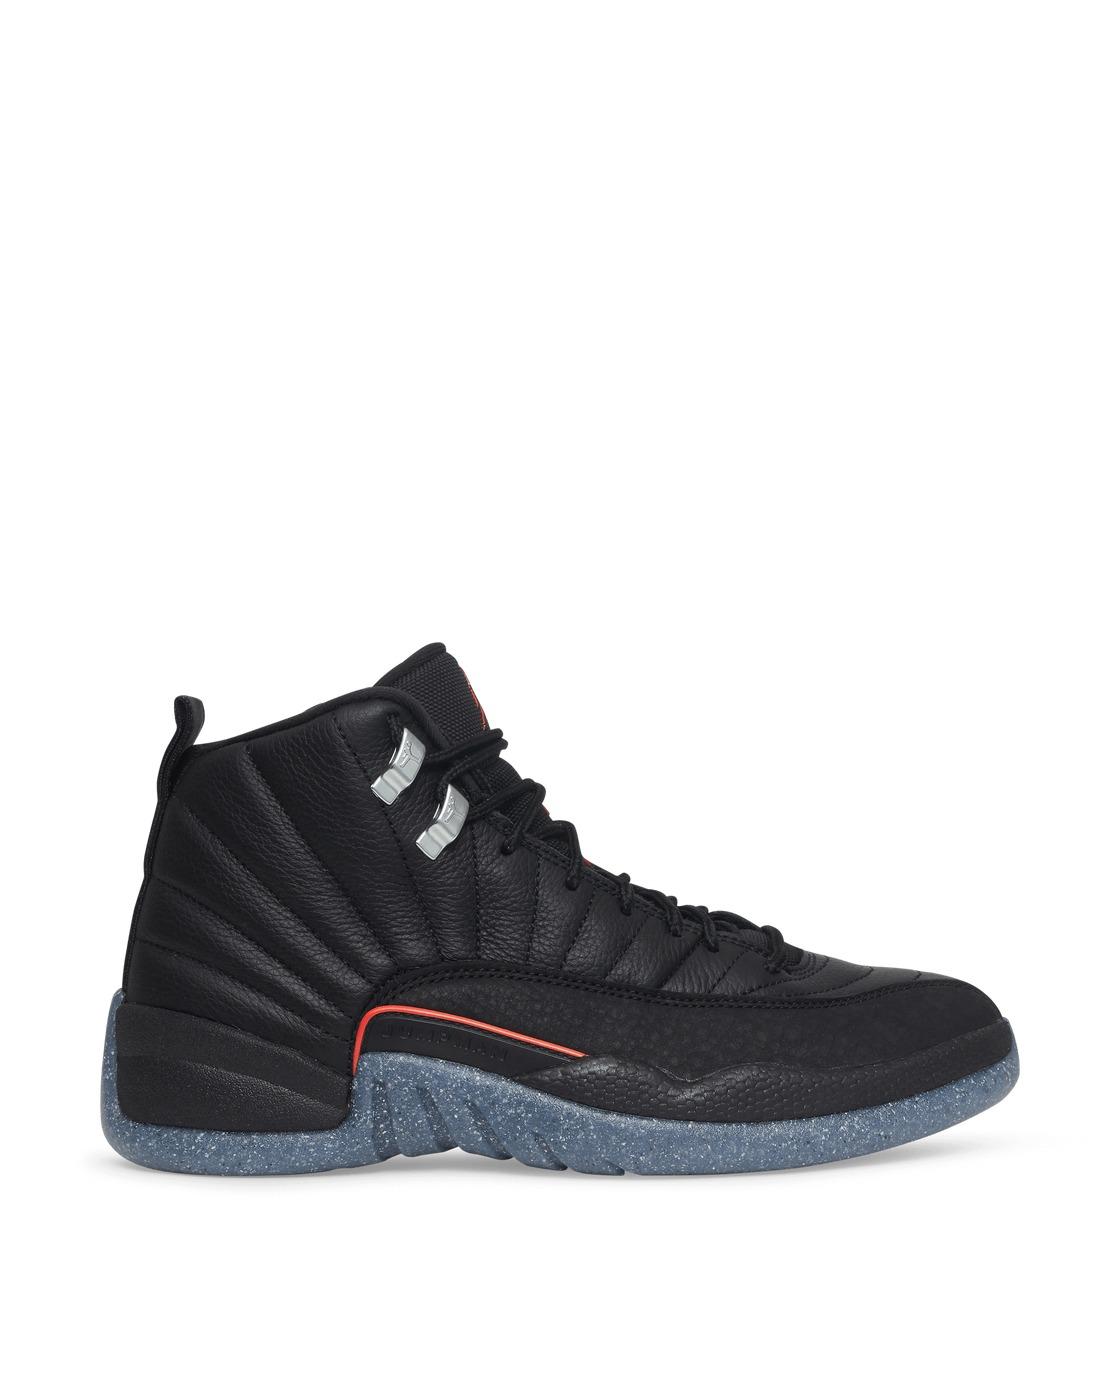 Photo: Nike Jordan Air Jordan 12 Retro Sneakers Black/Bright